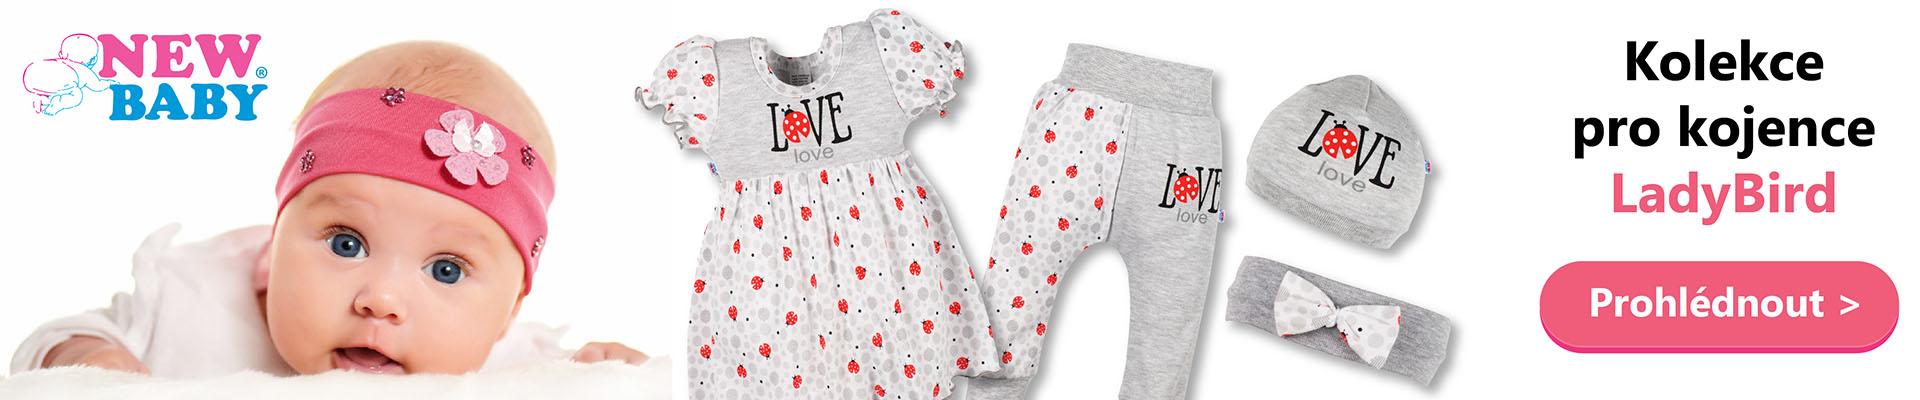 Kolekce pro kojence ladybird